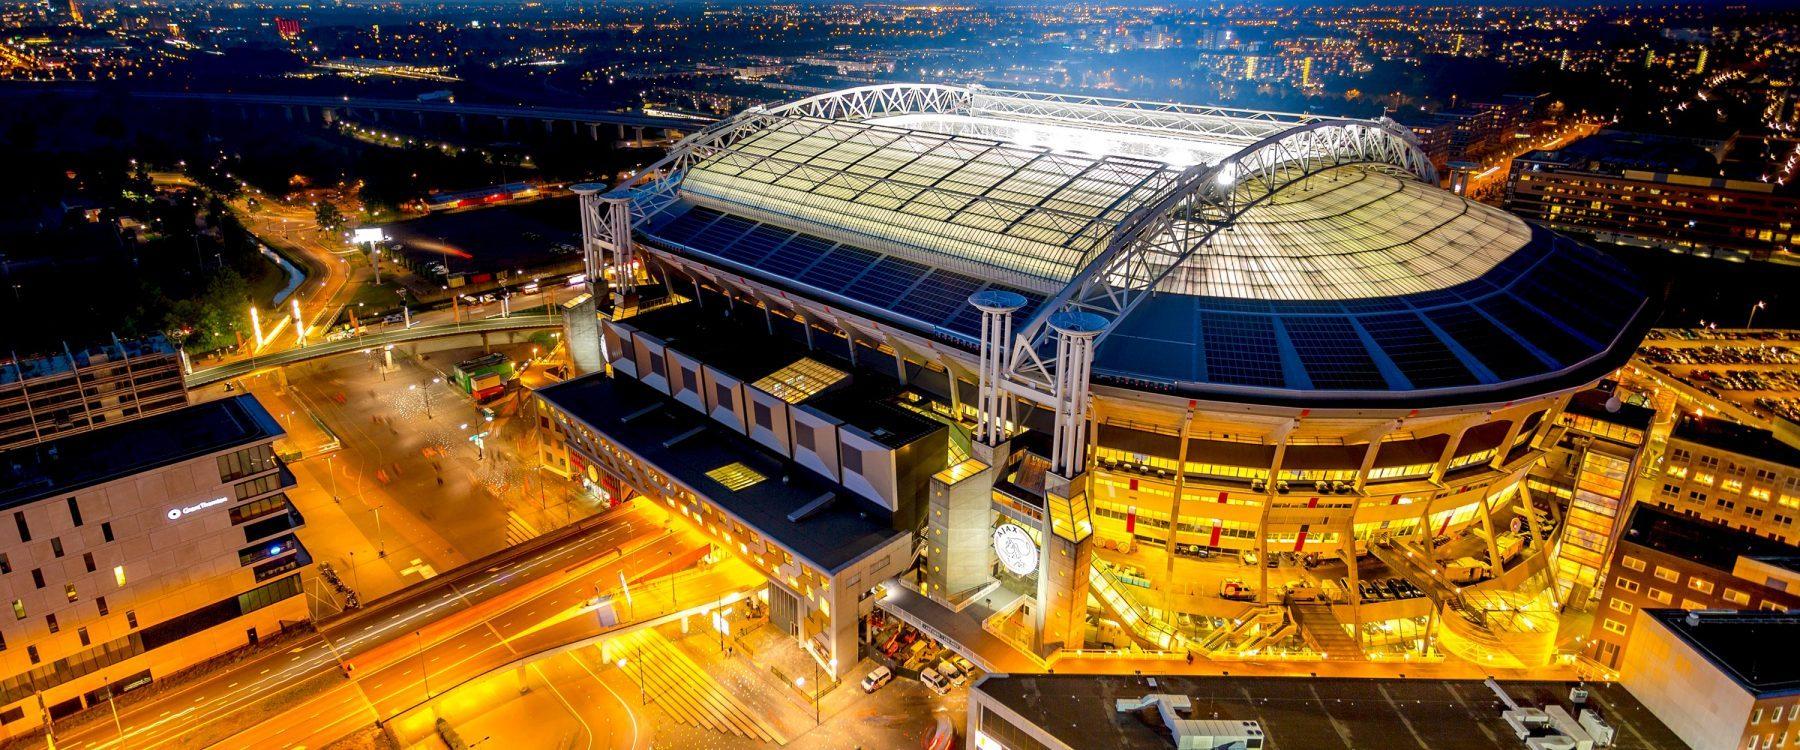 Amsterdam arena at night